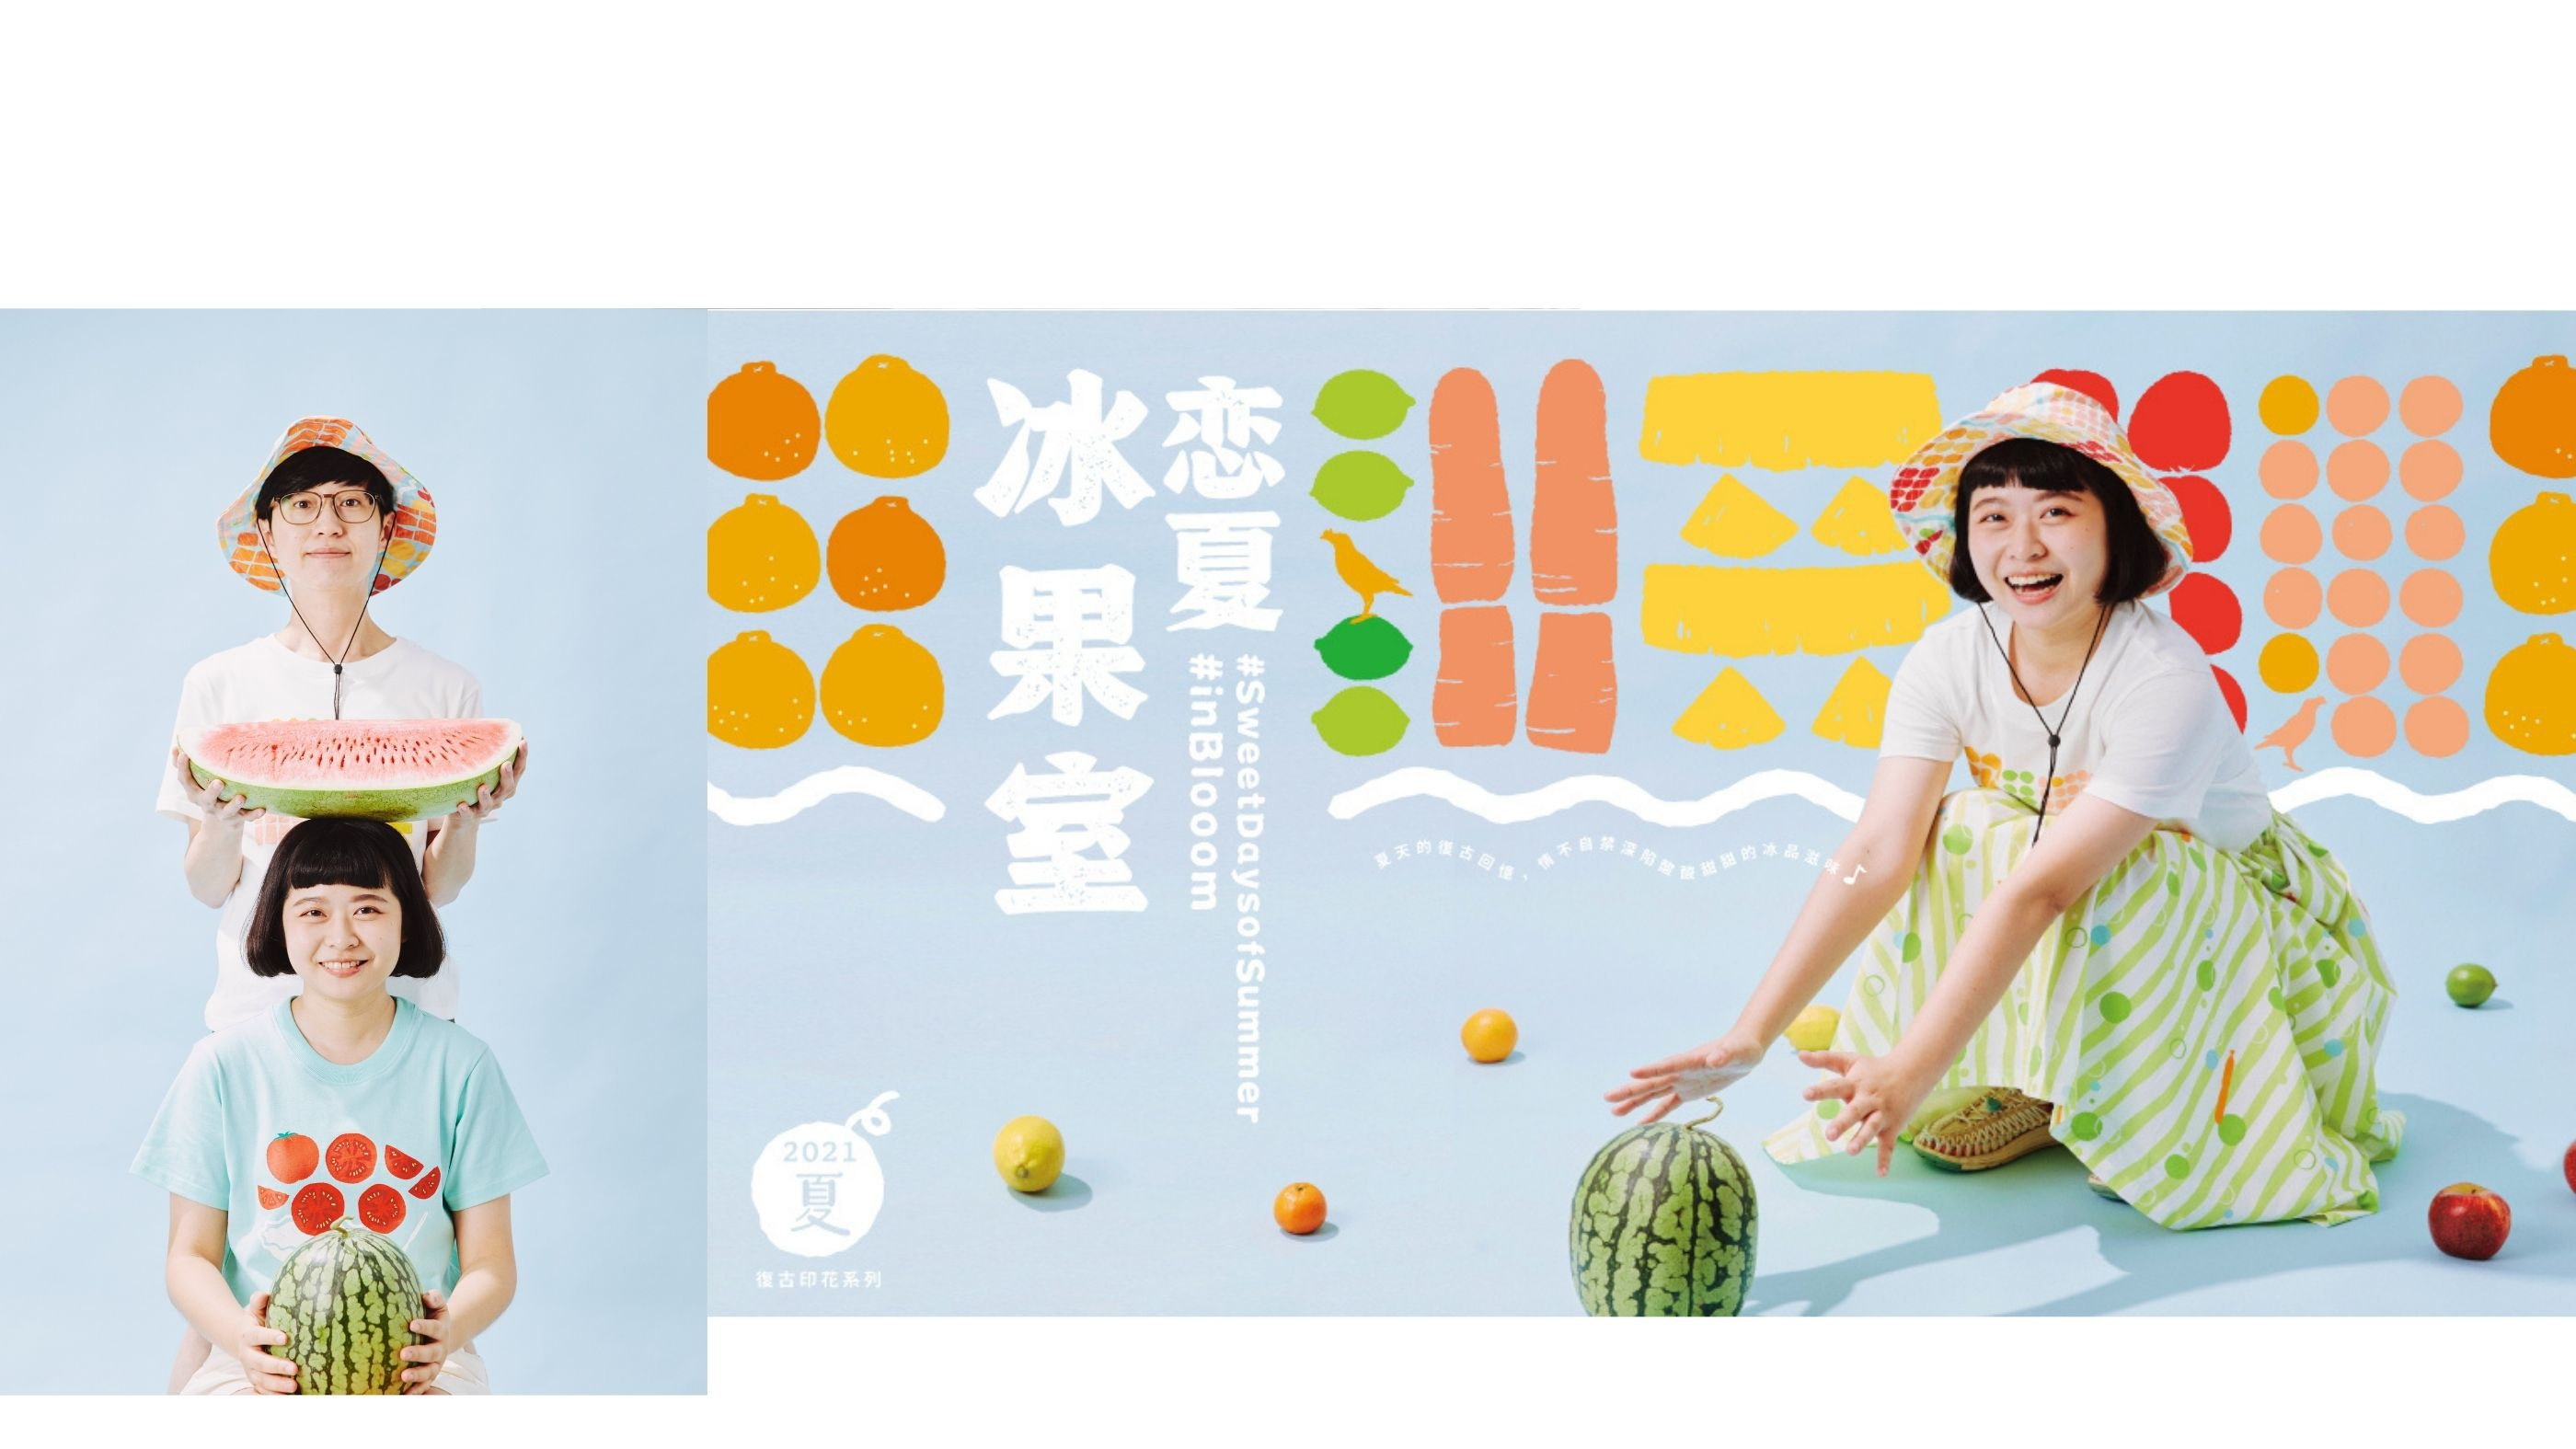 設計師品牌 - 印花樂 inBlooom